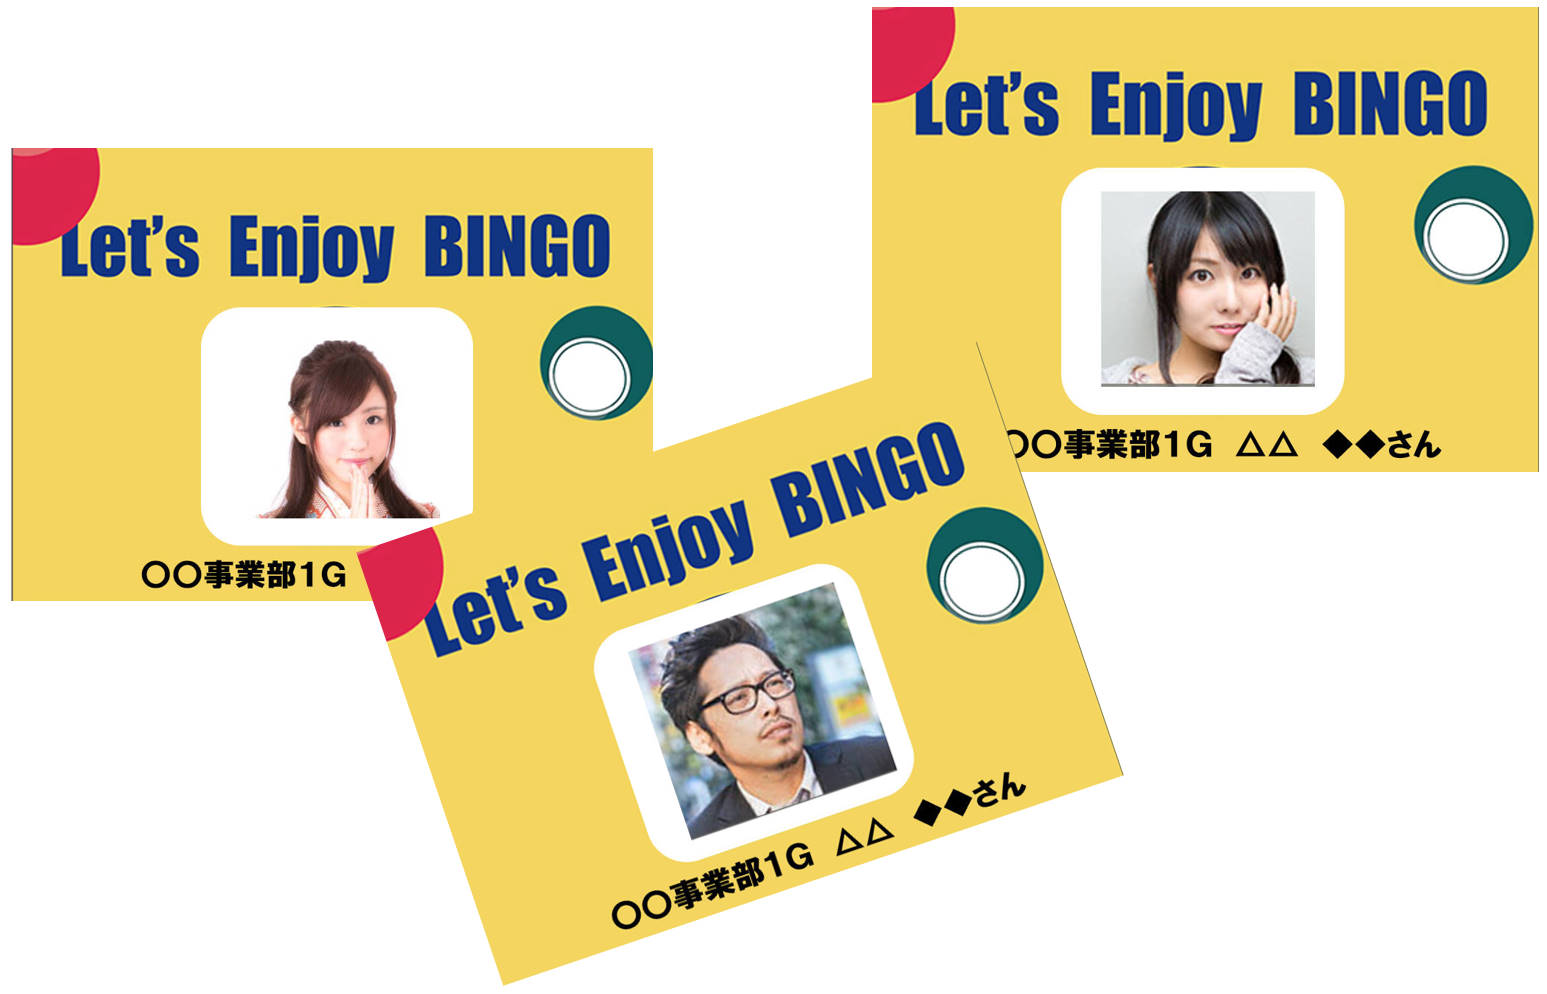 bingooriginalgrows5